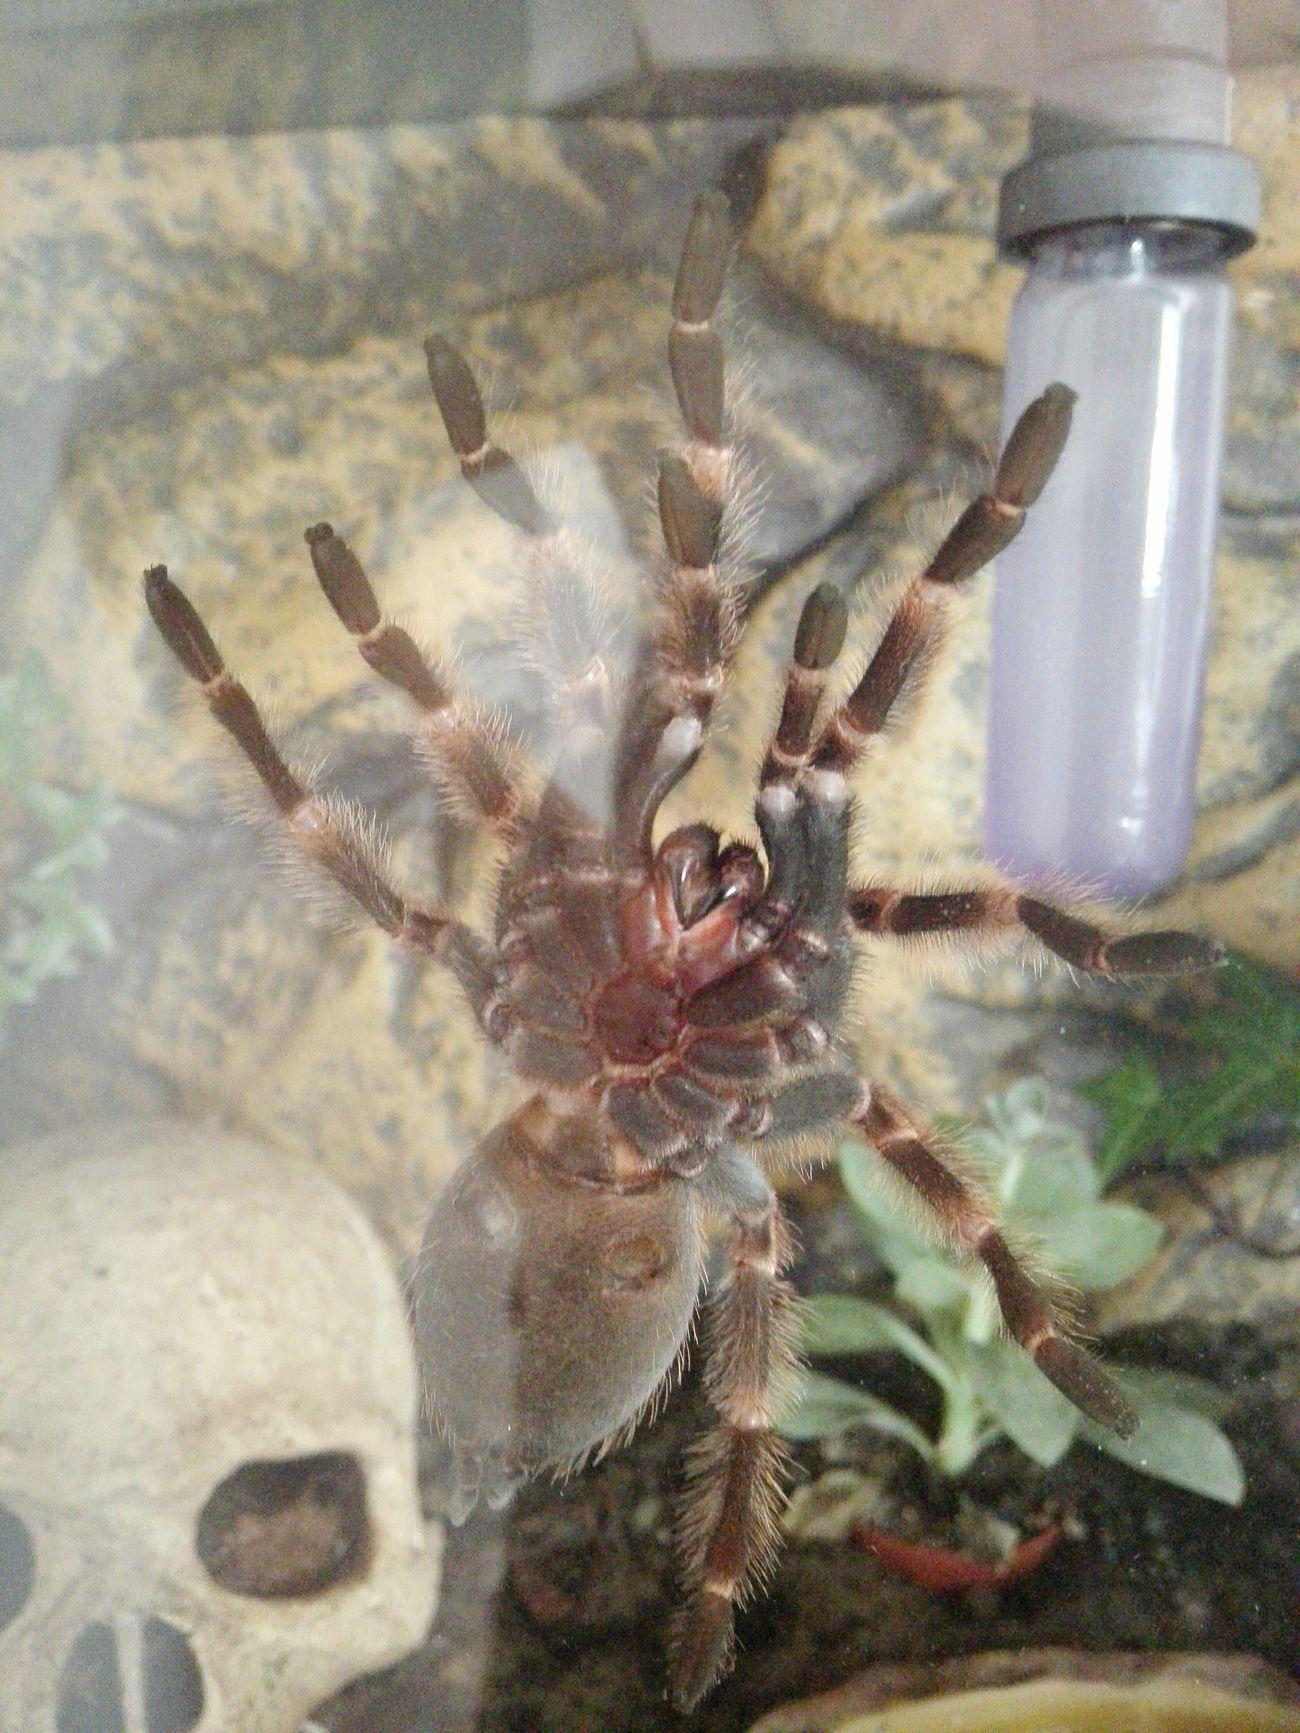 Spinne Marie - Brachypelma Smithi Brachypelma Tarantula Vogelspinne